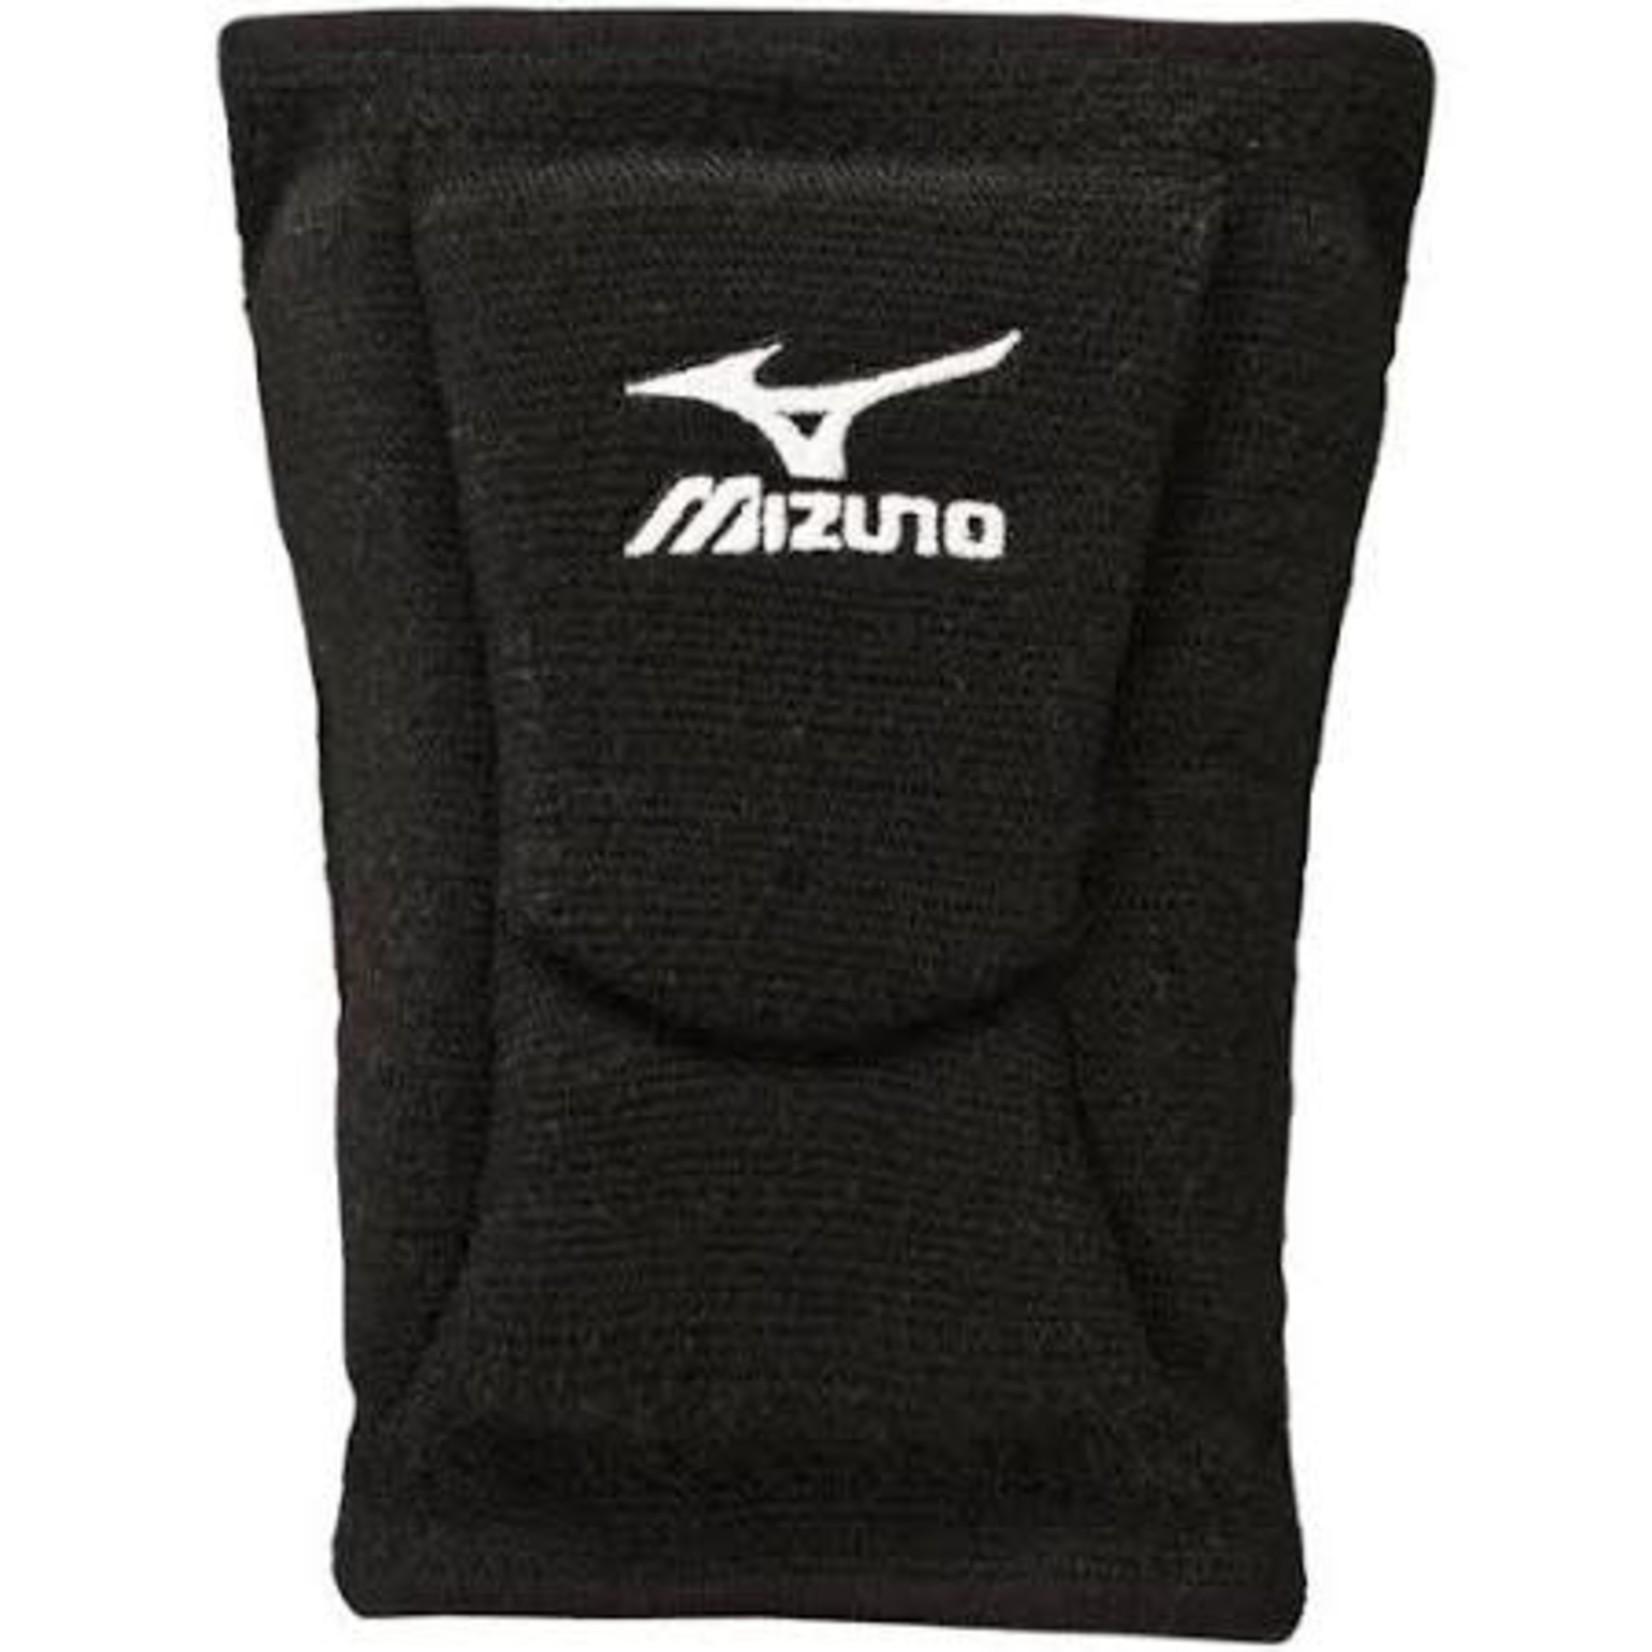 Mizuno Mizuno Volleyball Knee Pads, LR6